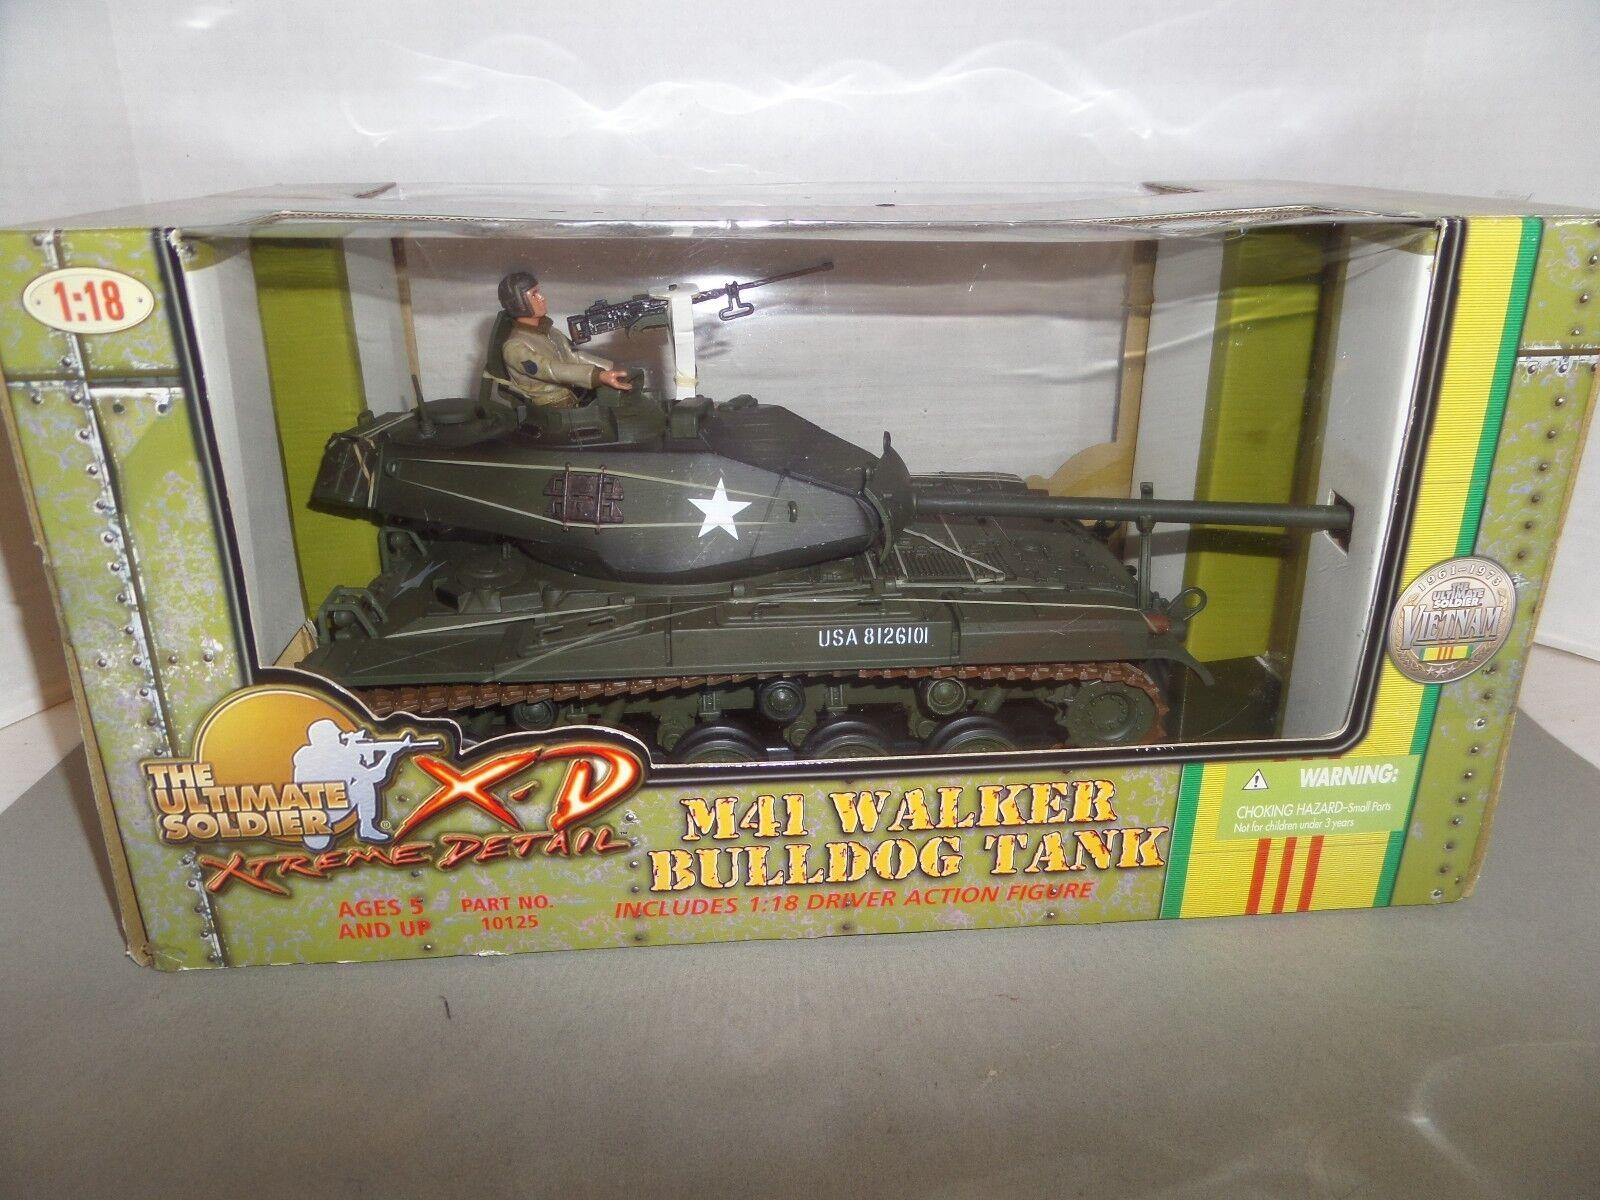 ULTIMATE SOLDIER M41 WALKER BULLDOG TANK 1 1 1 18 SCALE 61e891